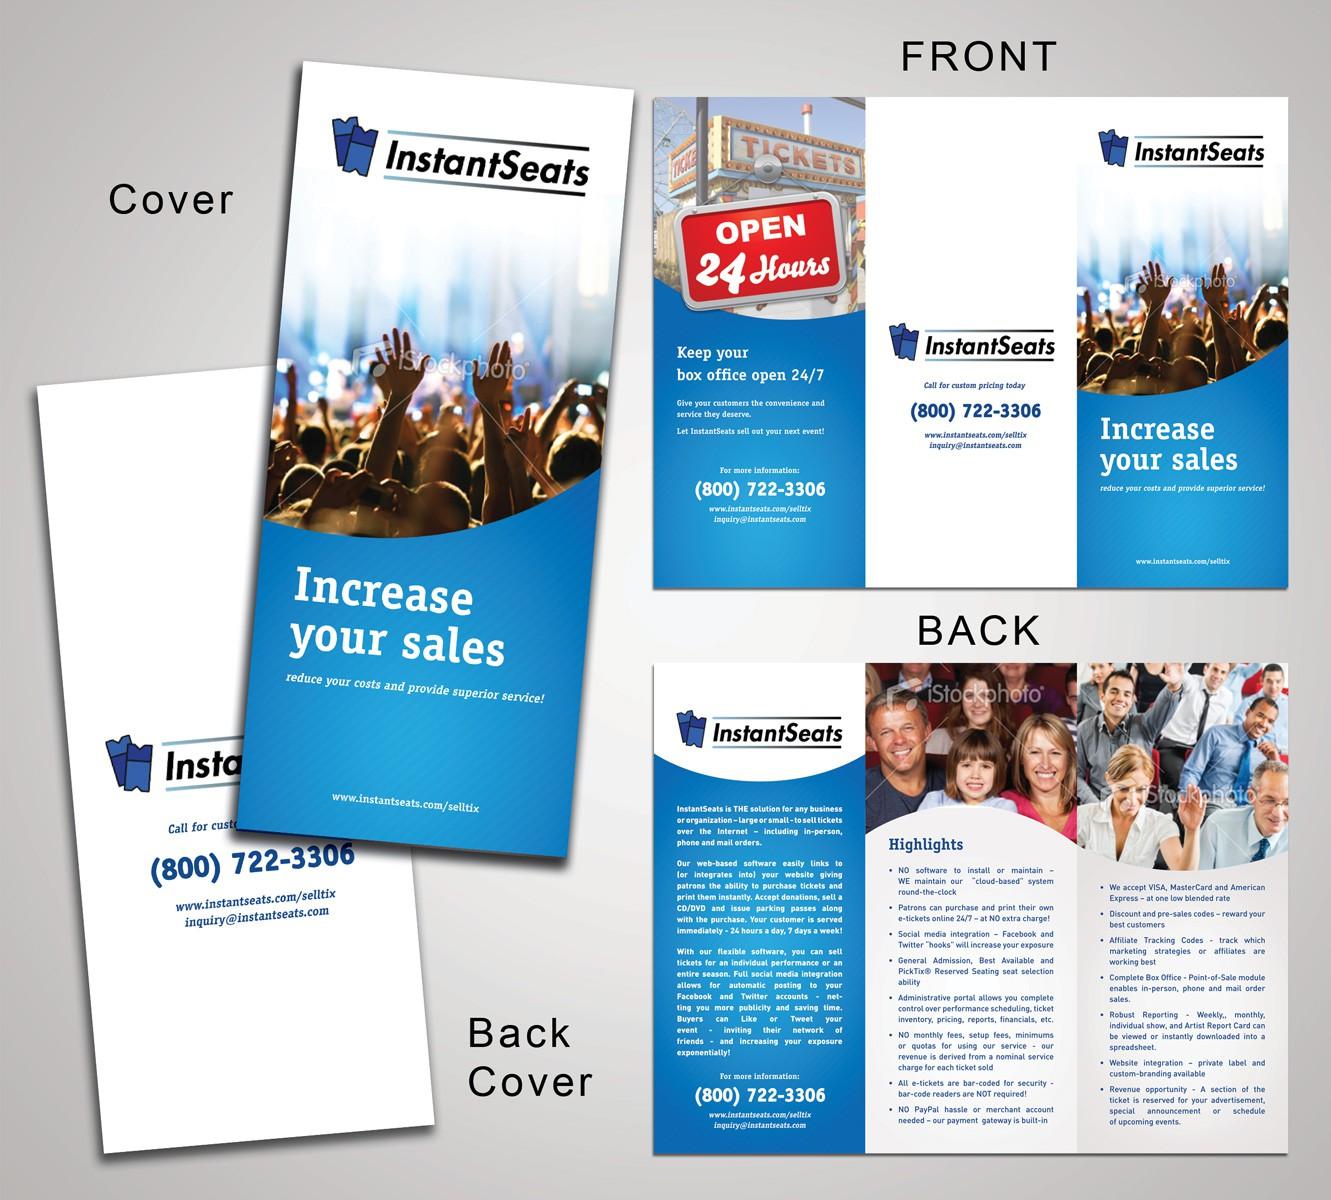 Help InstantSeats with a new brochure design